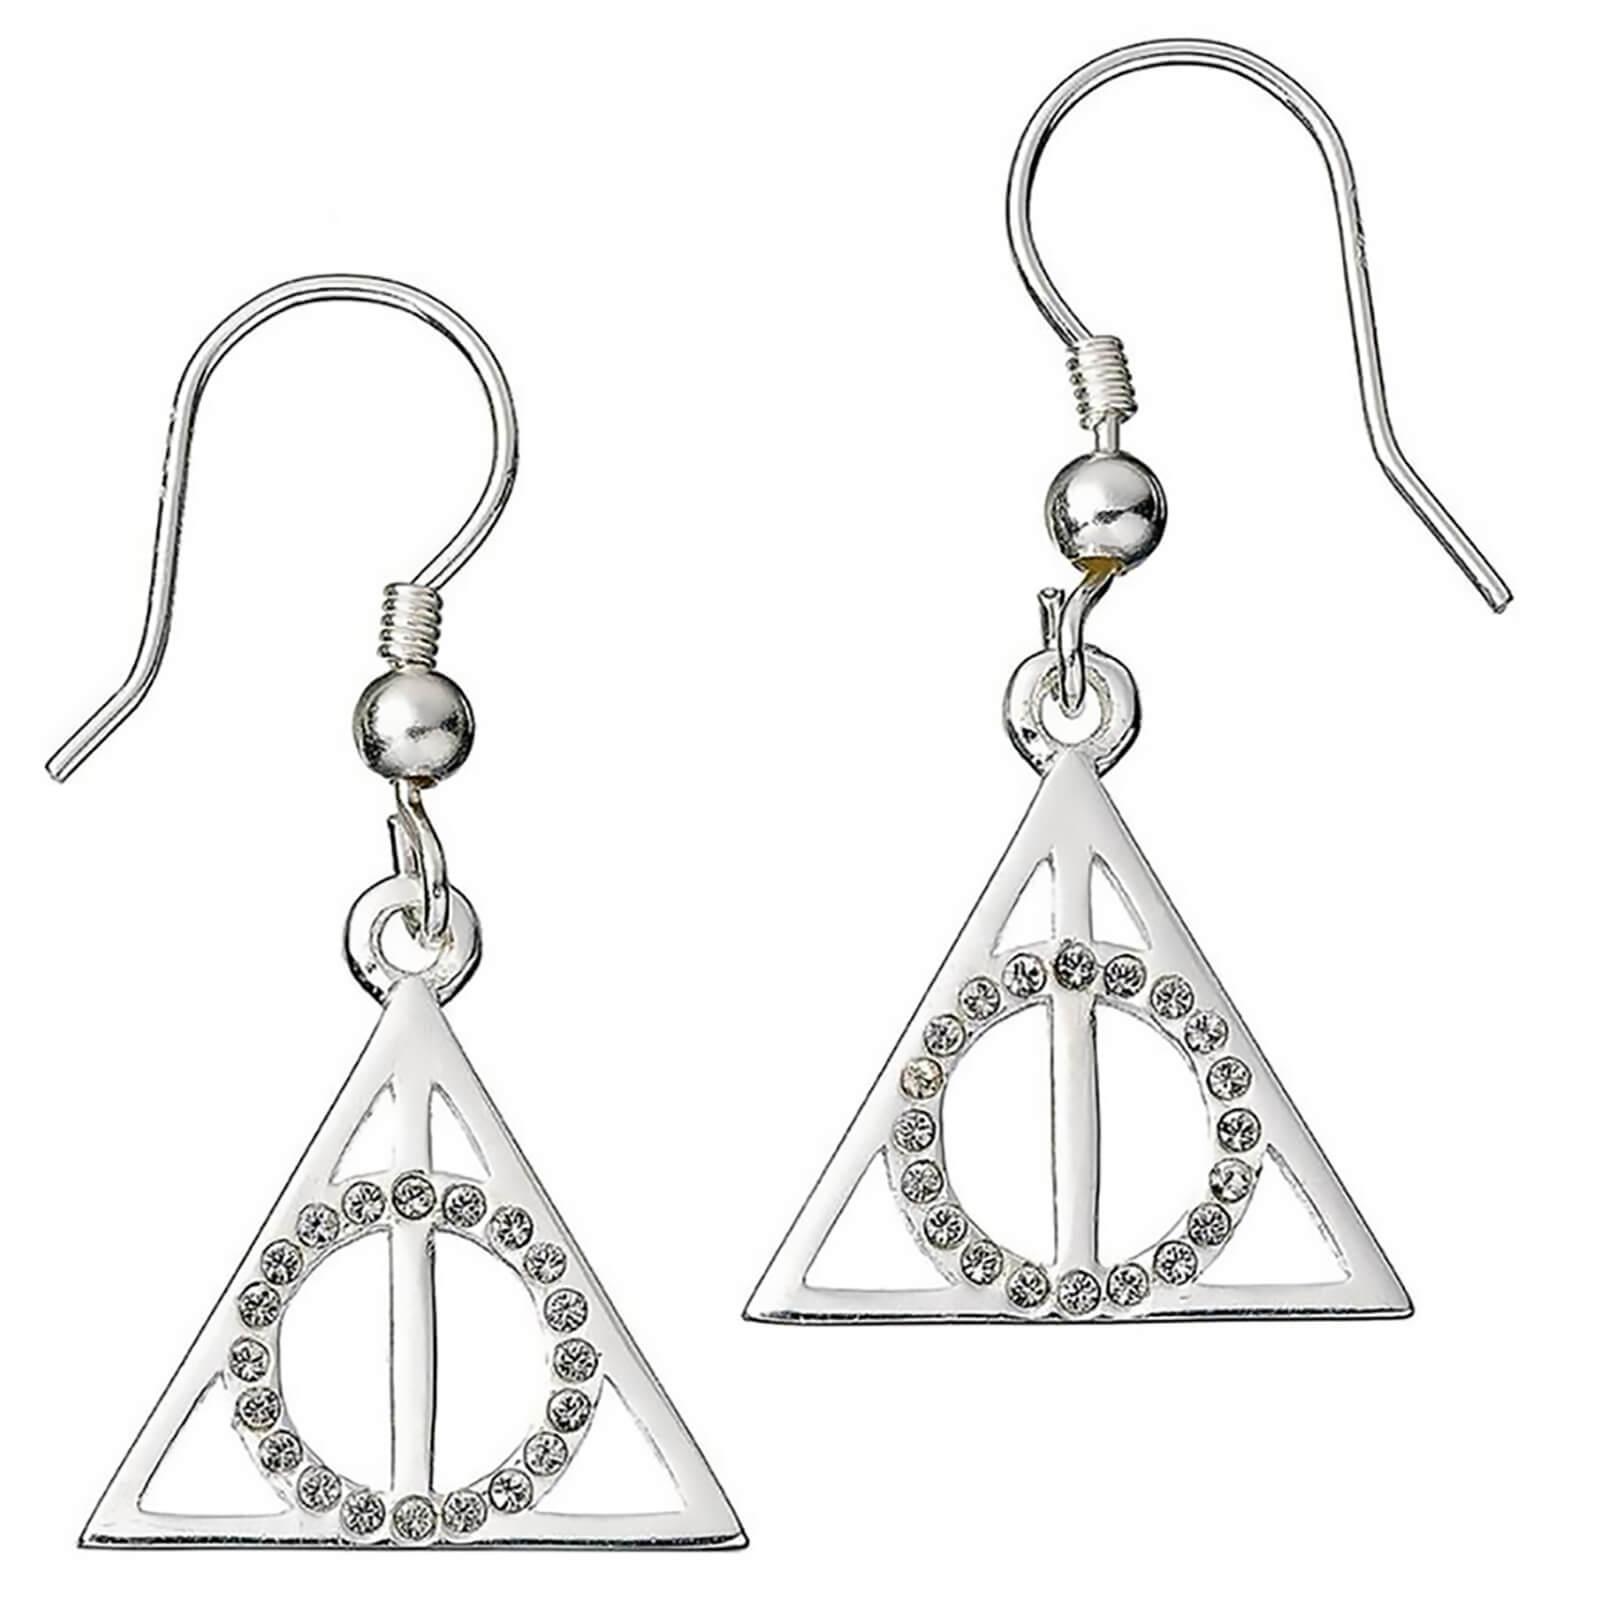 ea16dcc32 Harry Potter Deathly Hallows Earrings | My Geek Box